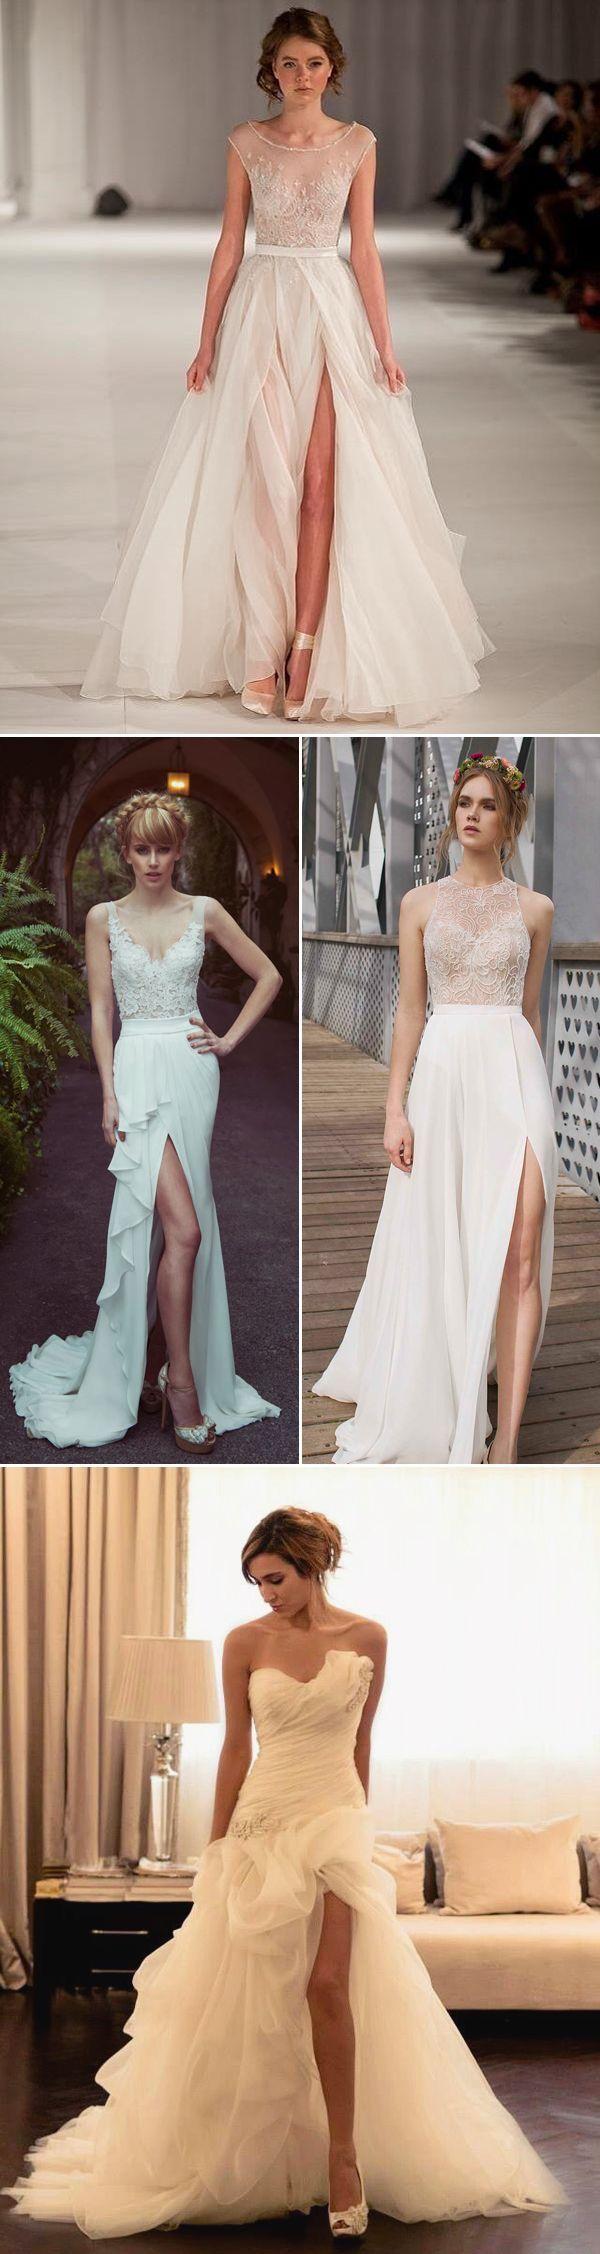 Pin by jasmine lema on weddings pinterest wedding dress